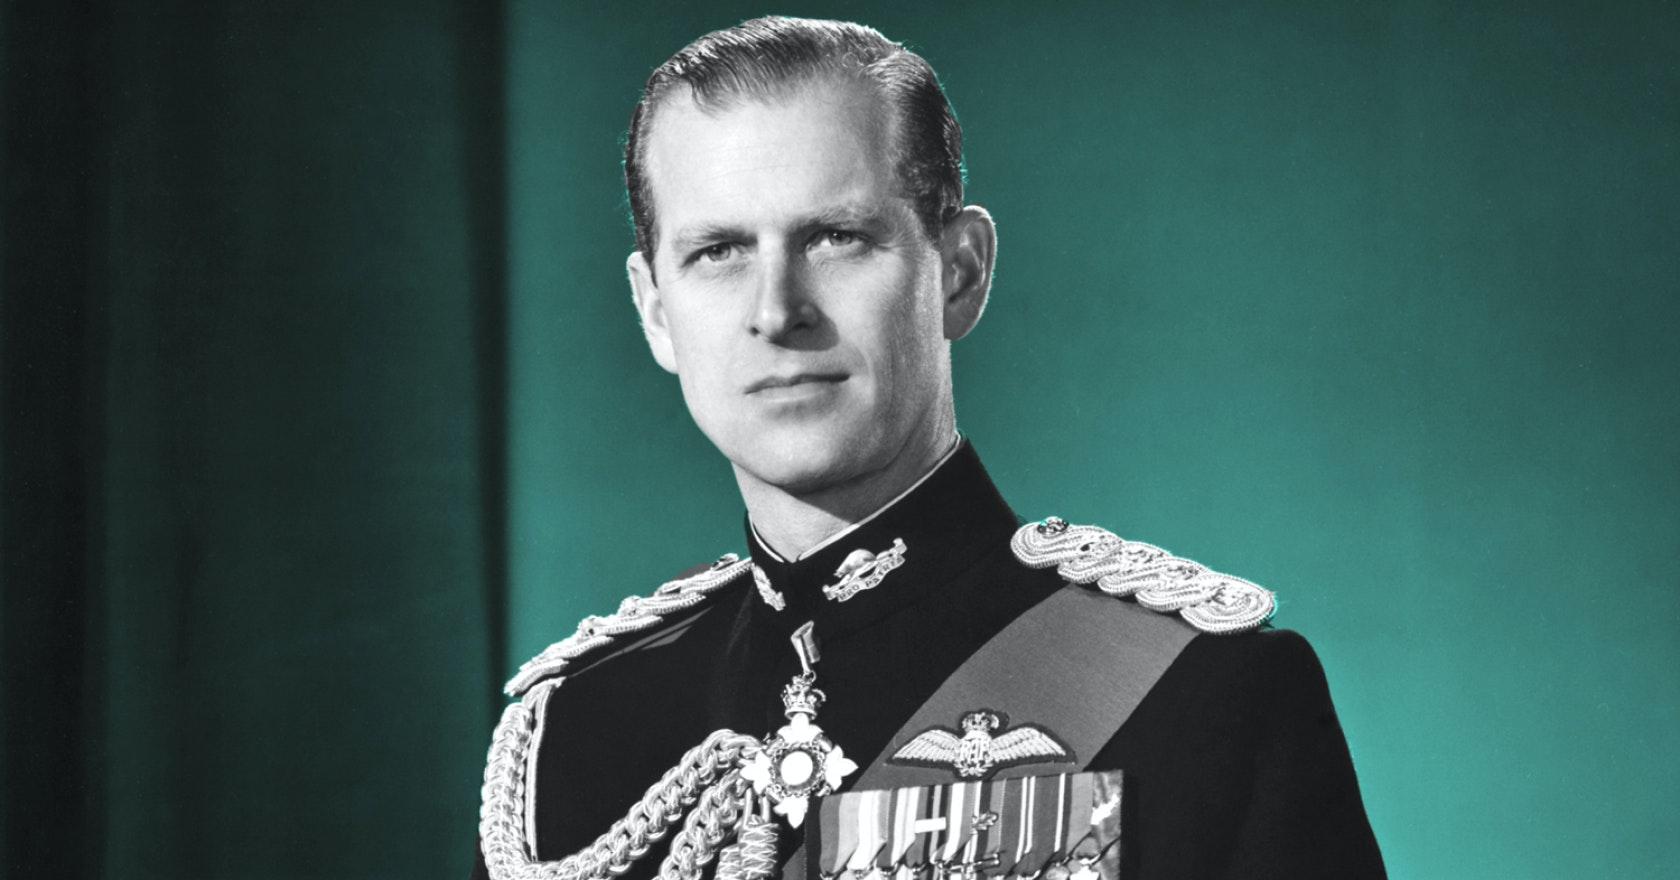 Prince Philip Duke of Edinburgh is the Queens husband